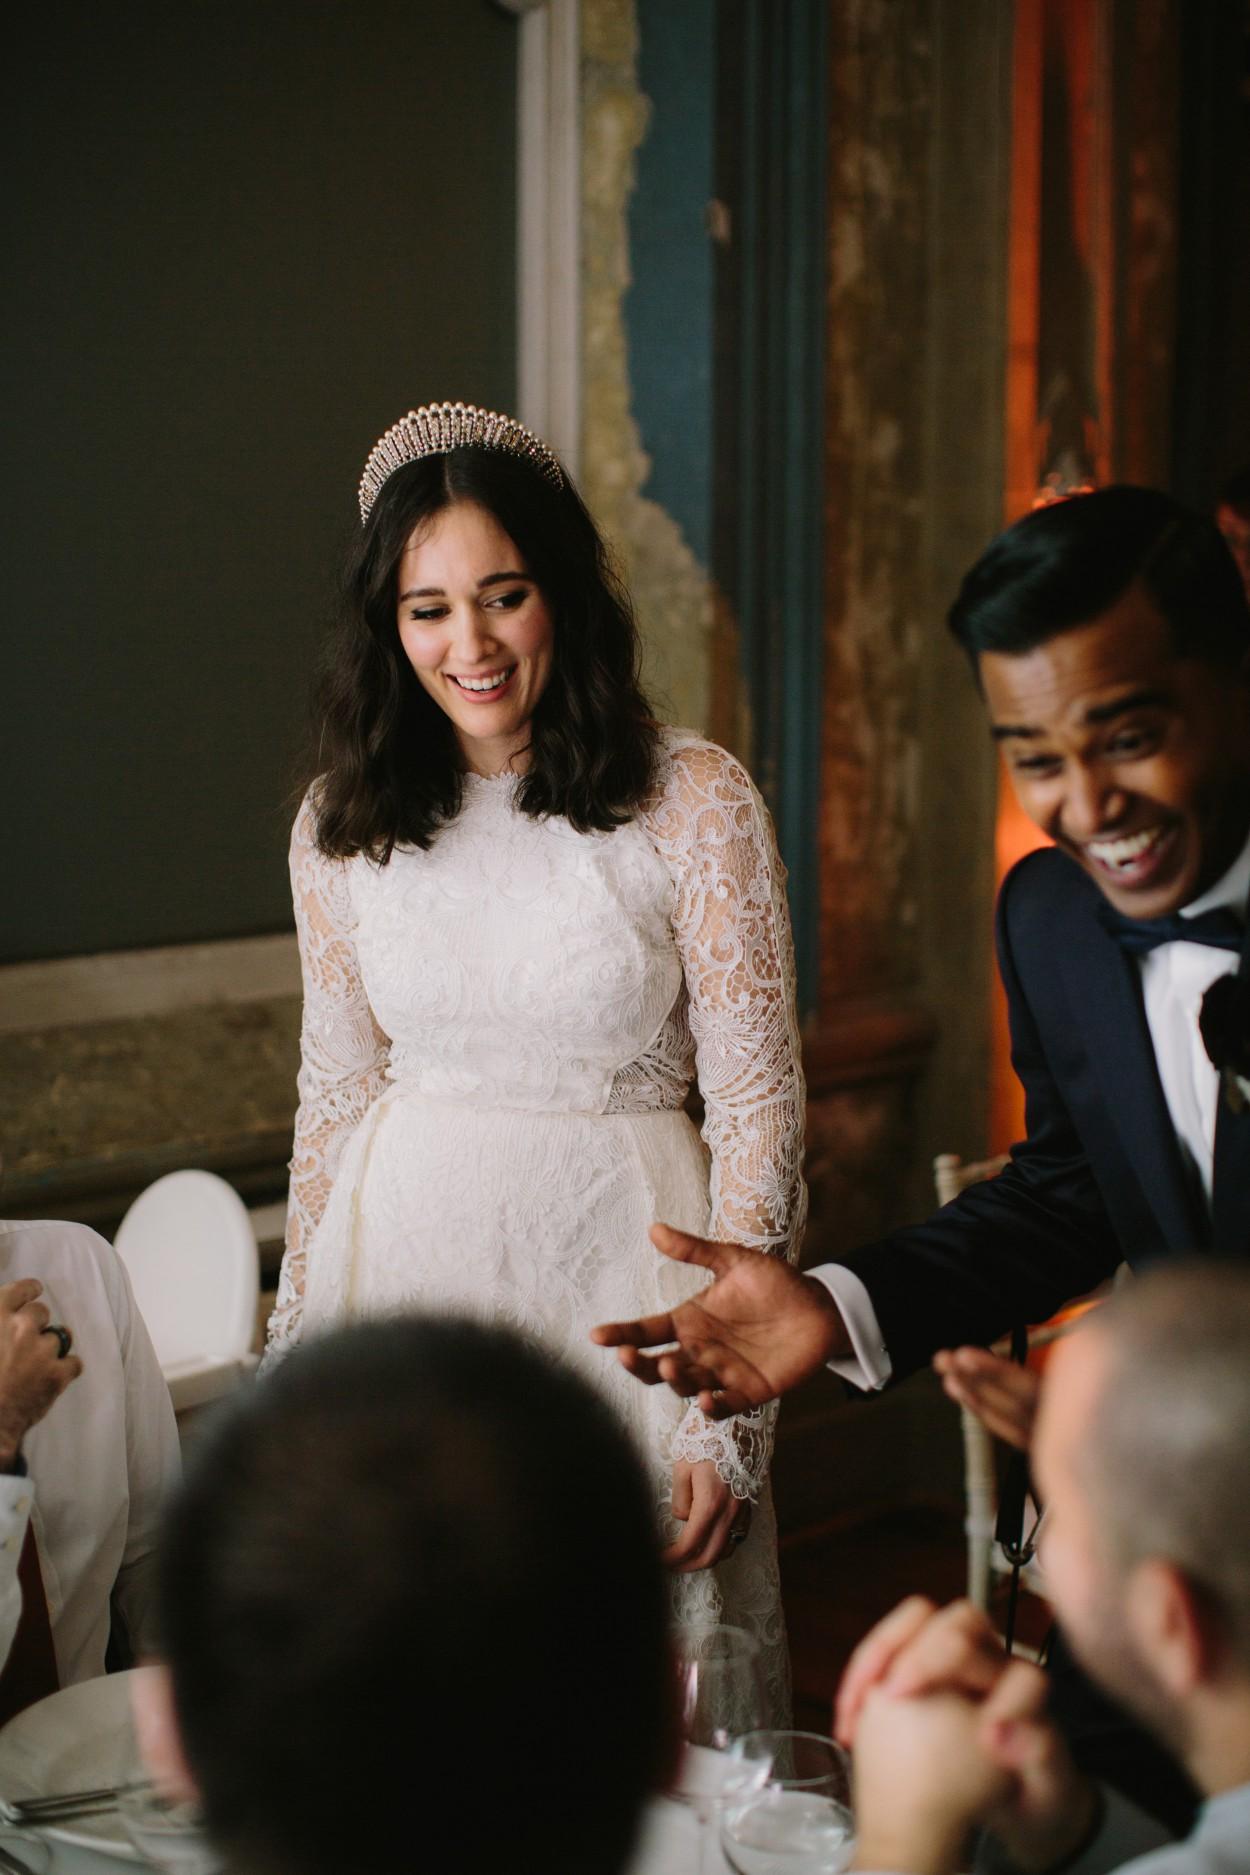 I-Got-You-Babe-Weddings-The-110George-Ballroom-St-Kilda-Wedding-Amy-Abhi.jpg